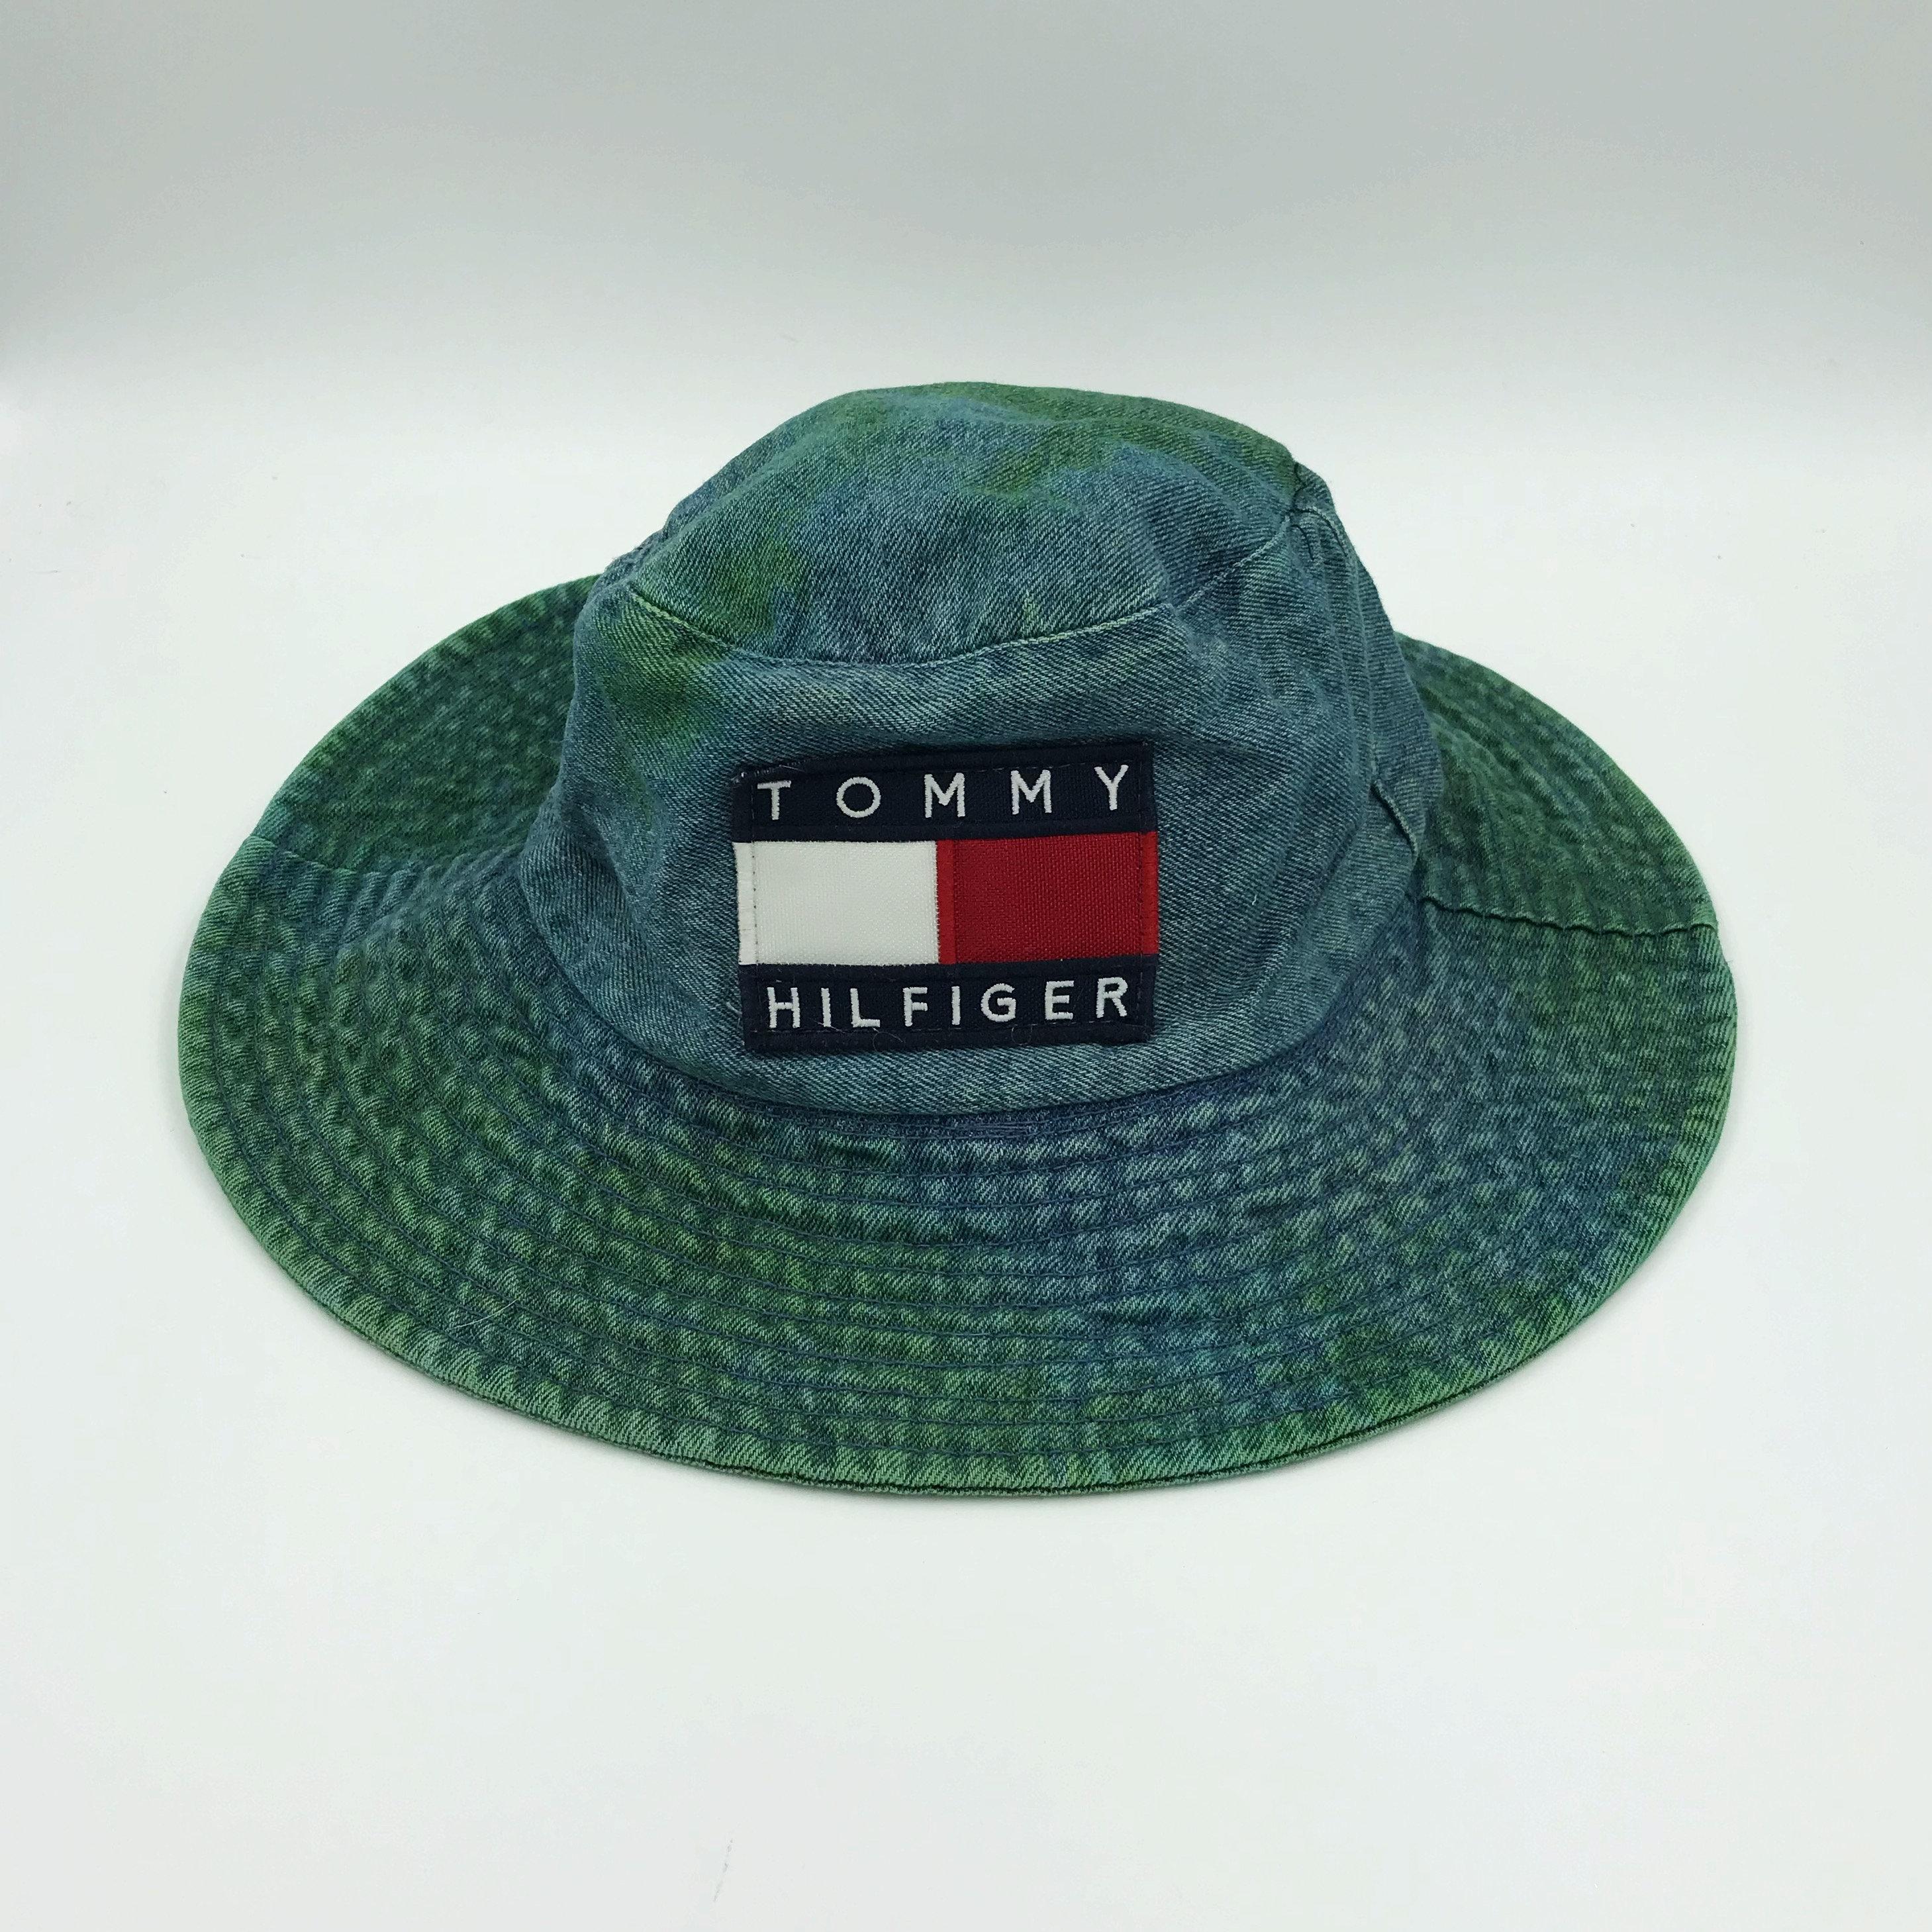 01b0701960c Tommy Hilfiger Patch Denim Bucket Sun Hat - Tie Dye Acid Wash ...